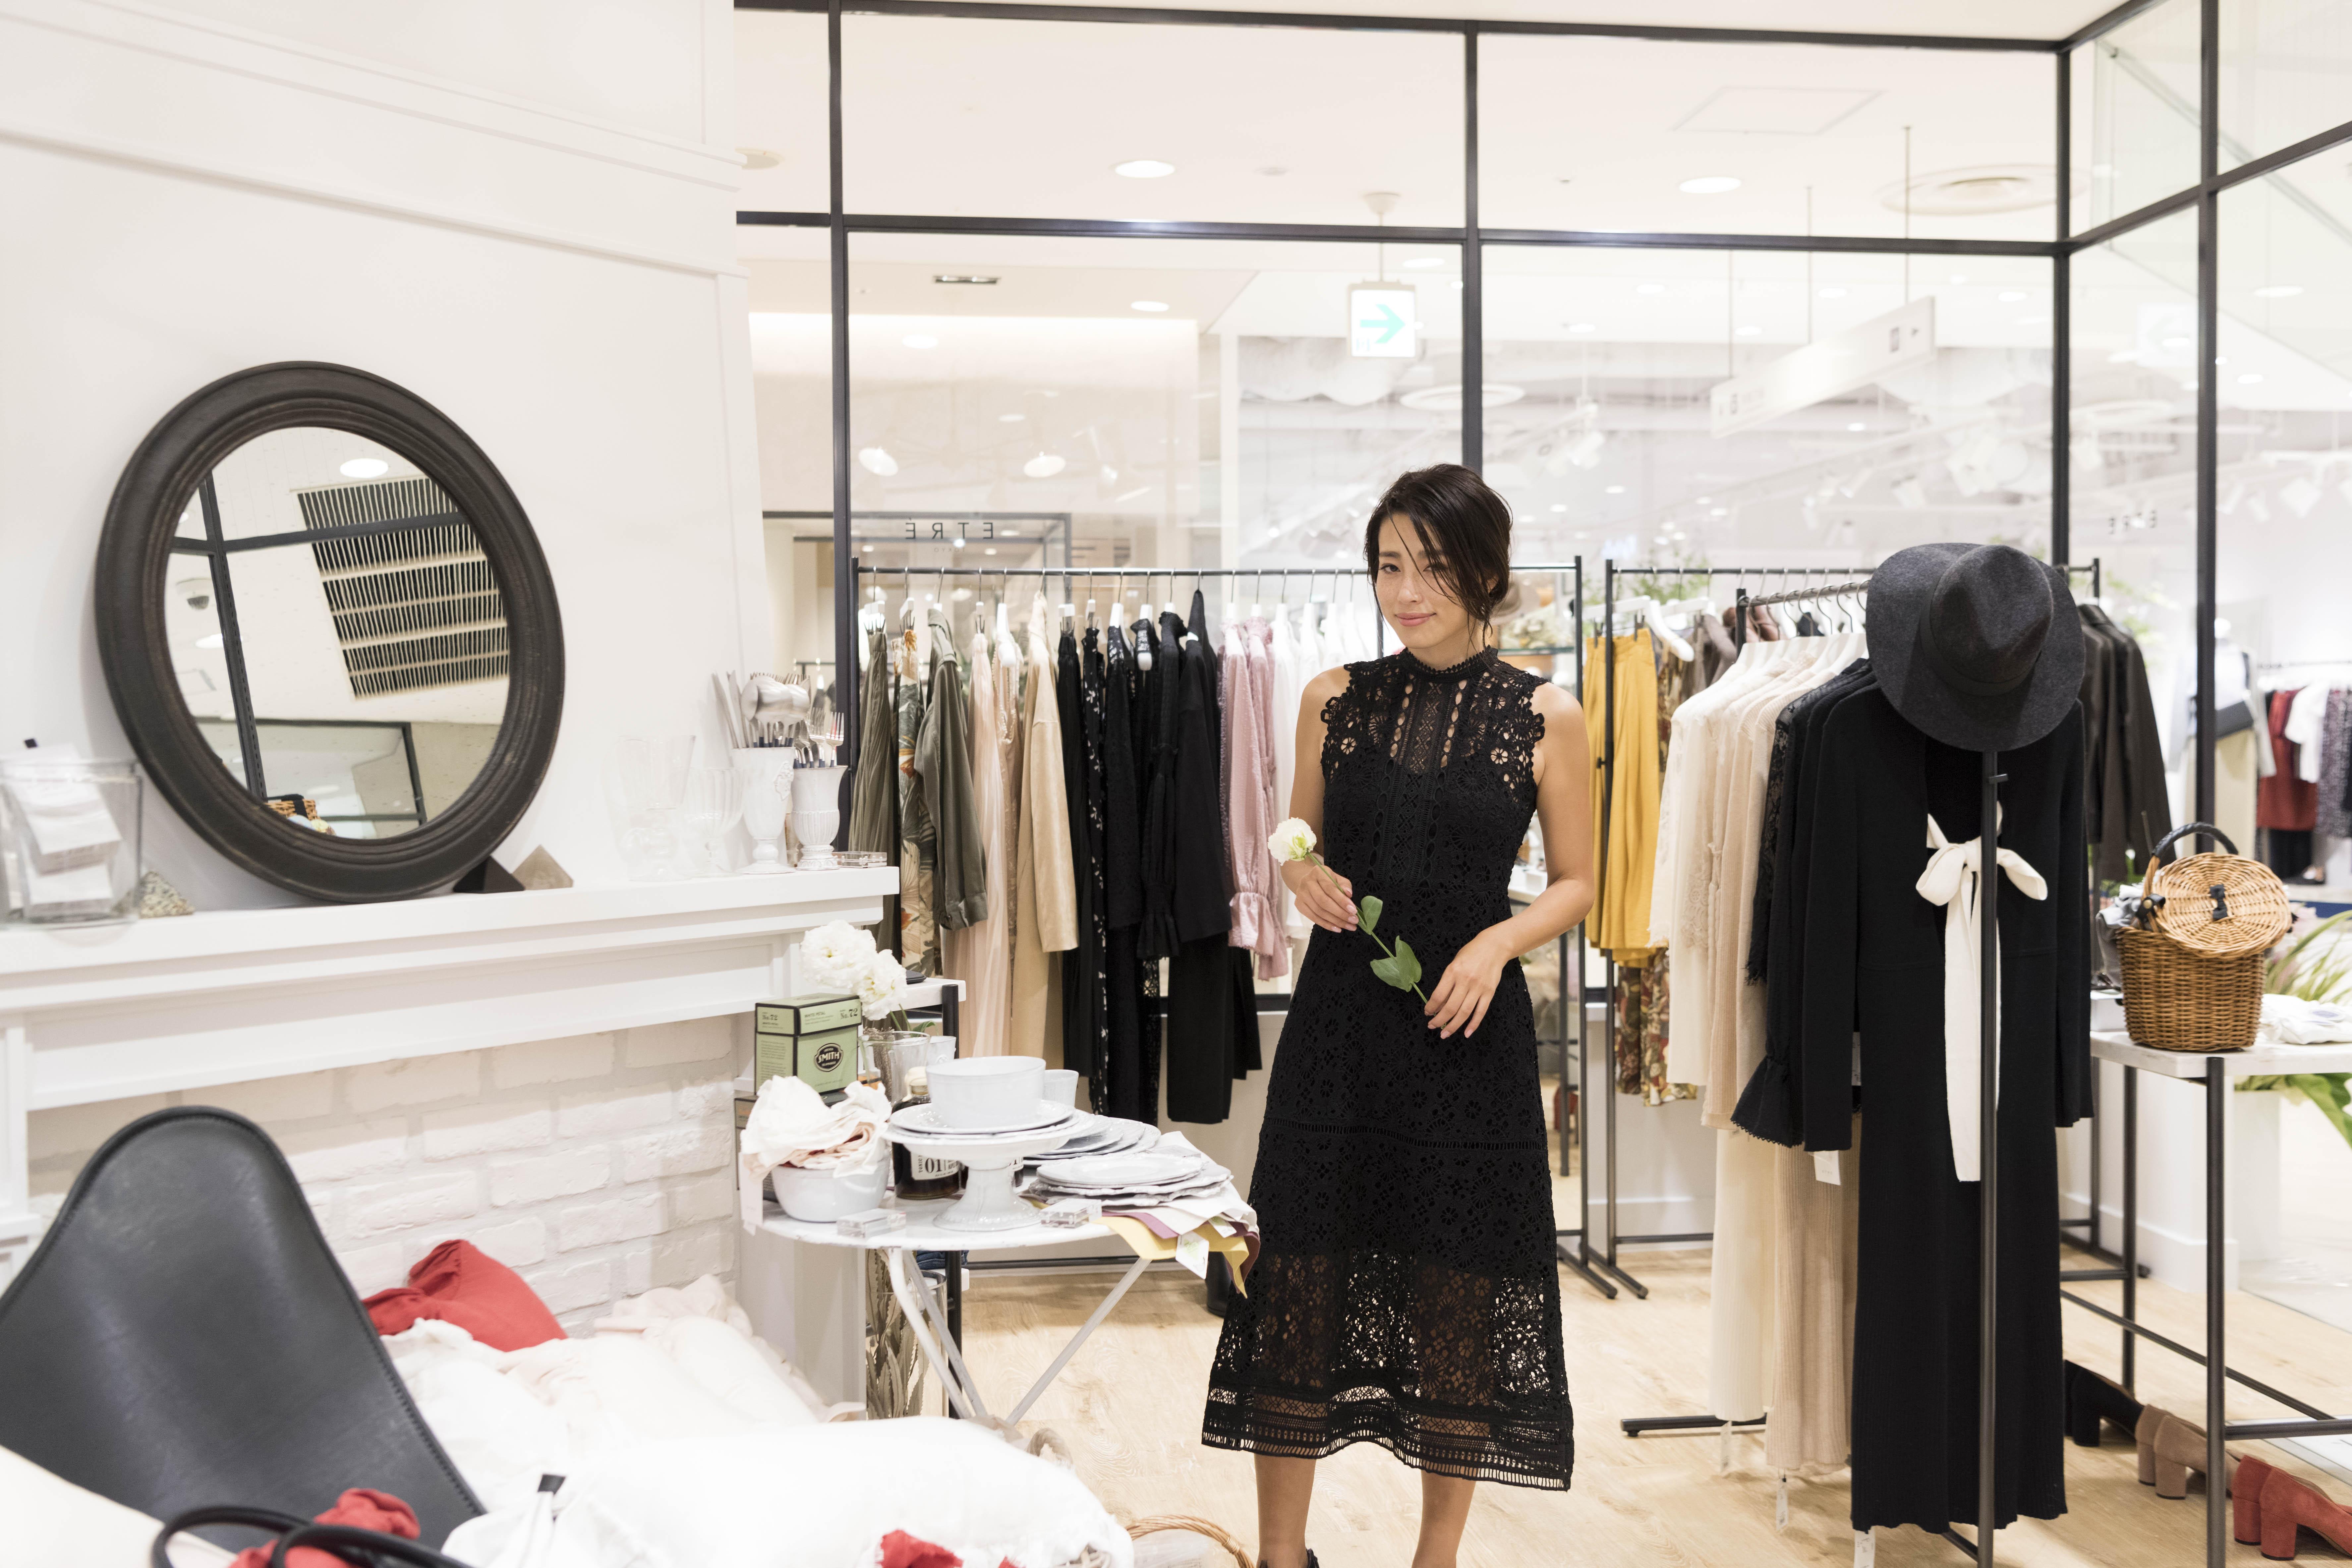 ETRÉ TOKYO SHINJUKUが本日9/7(木)オープン! プレオープンではルミネ新宿ルミネ2同区画における単日過去最高売上を記録。